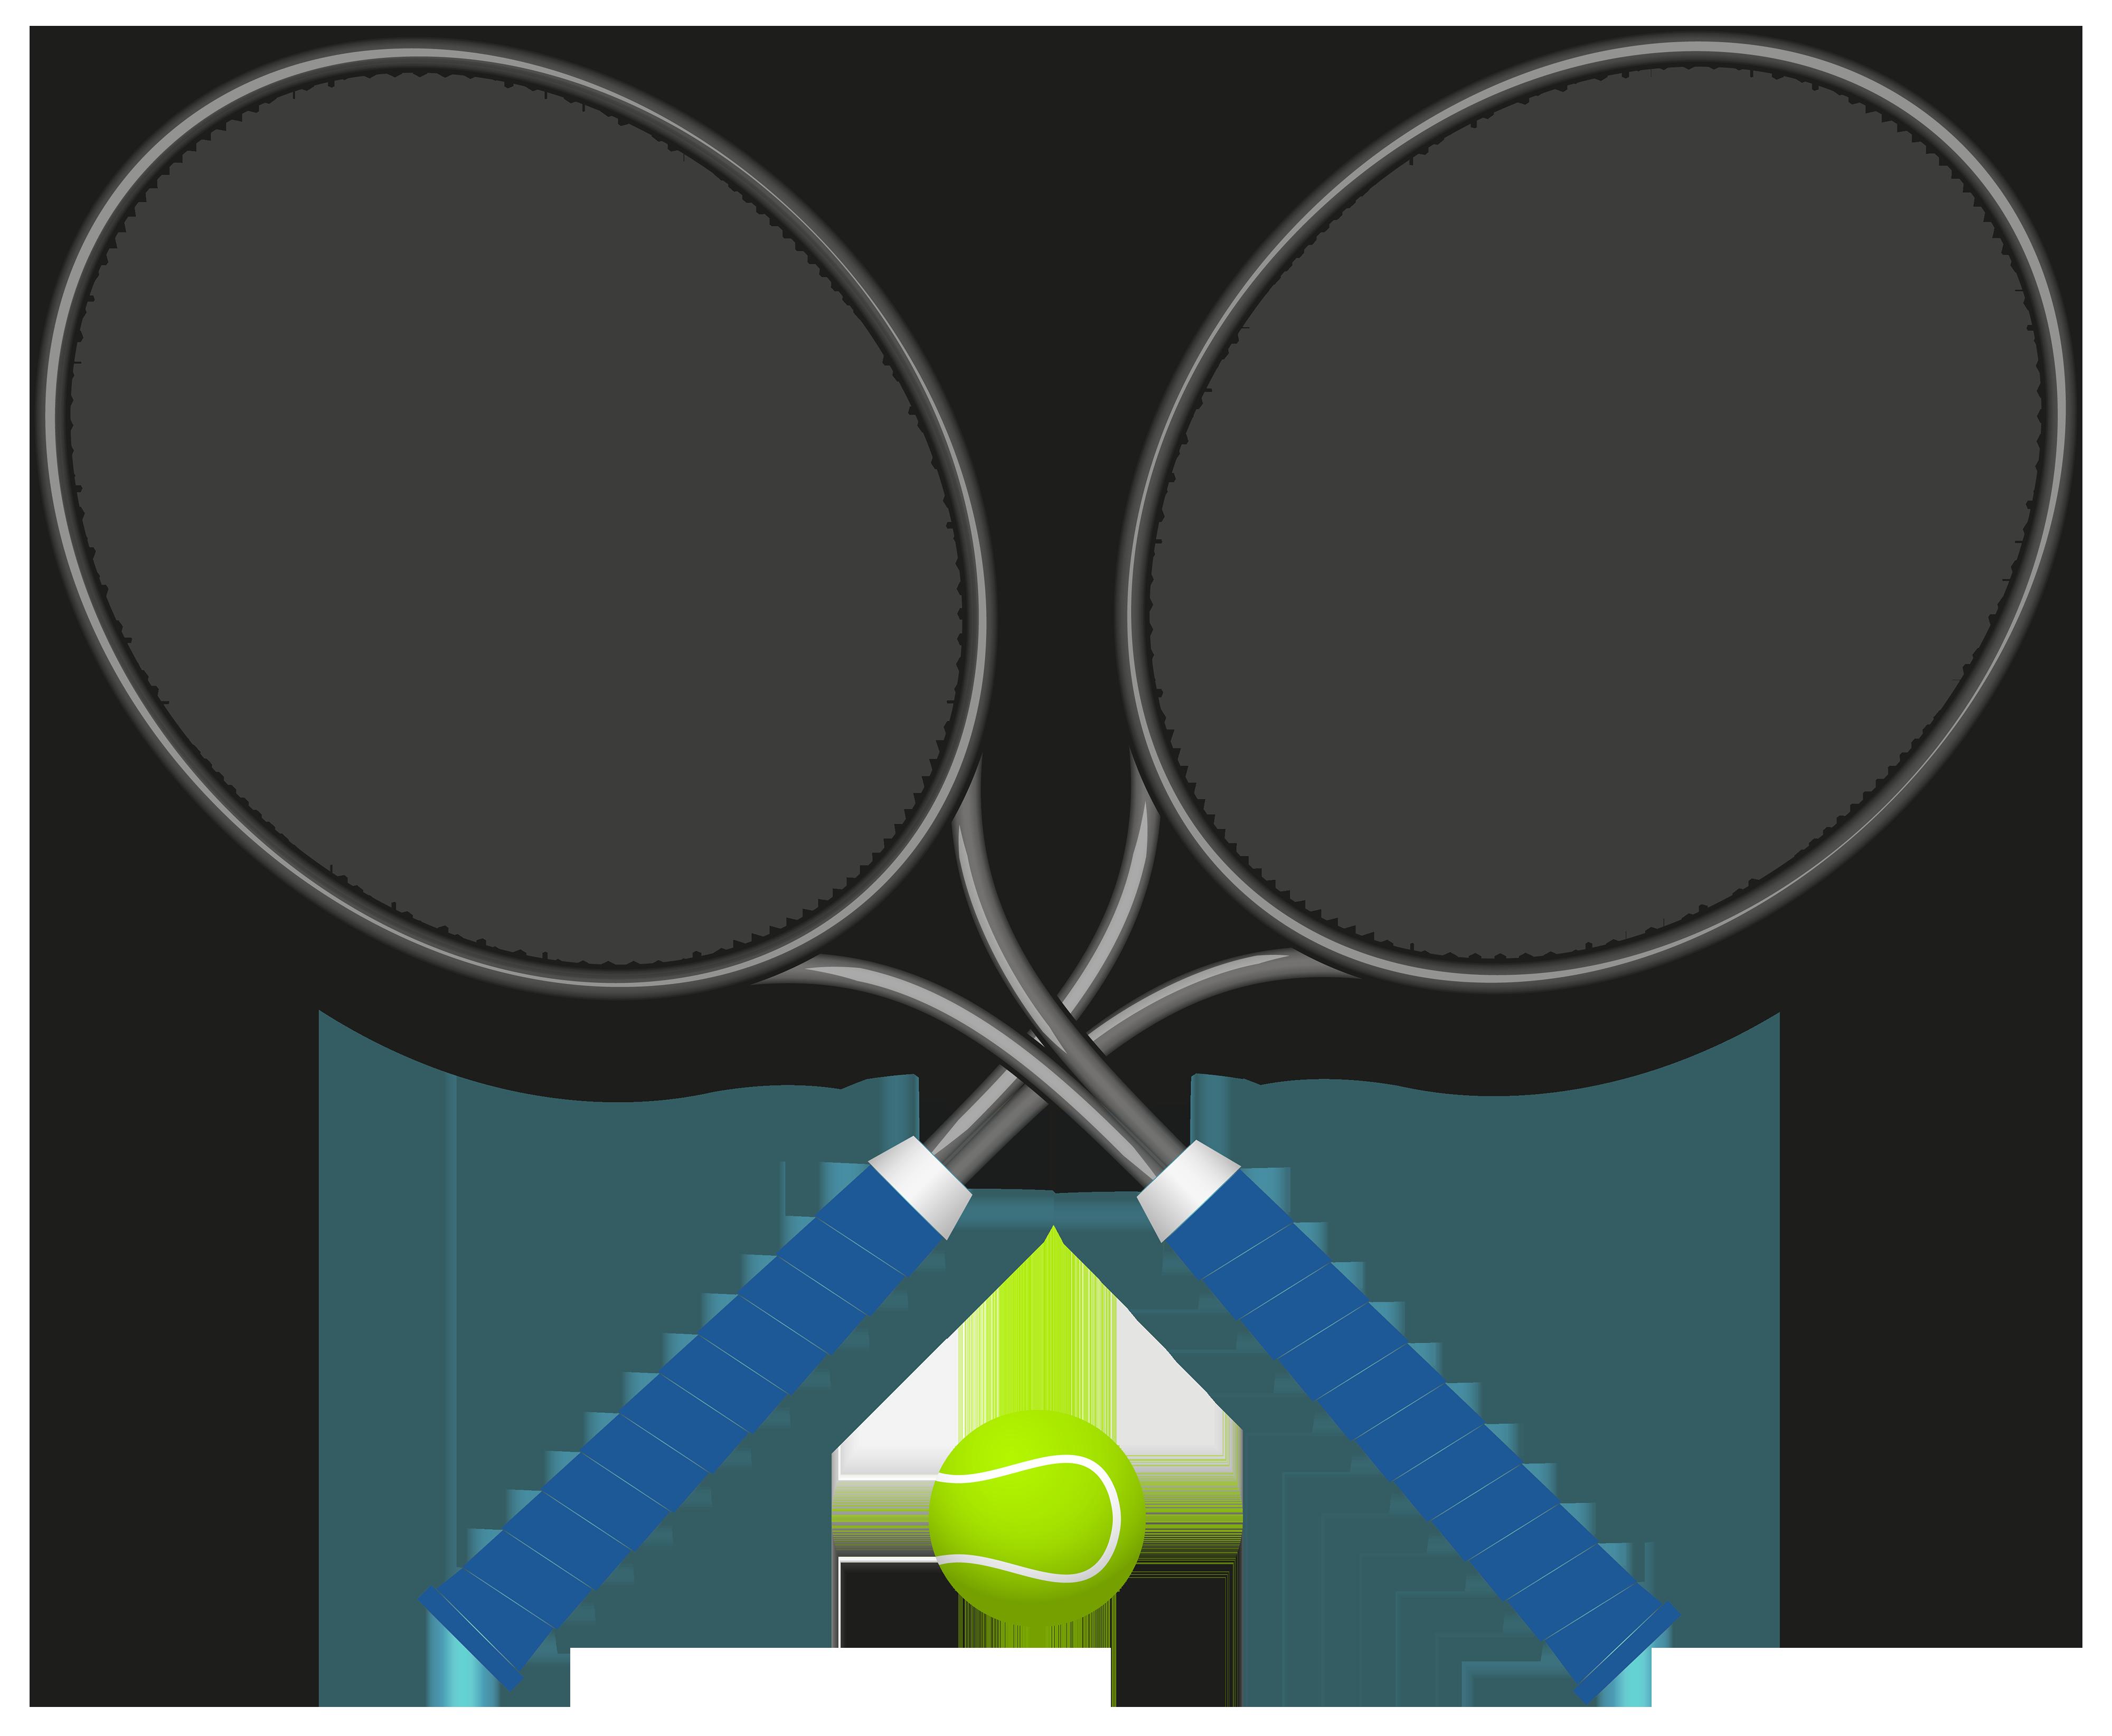 Clipart tennis racket with money clip art freeuse download Tennis Rackets with Ball PNG Clipart - Best WEB Clipart clip art freeuse download